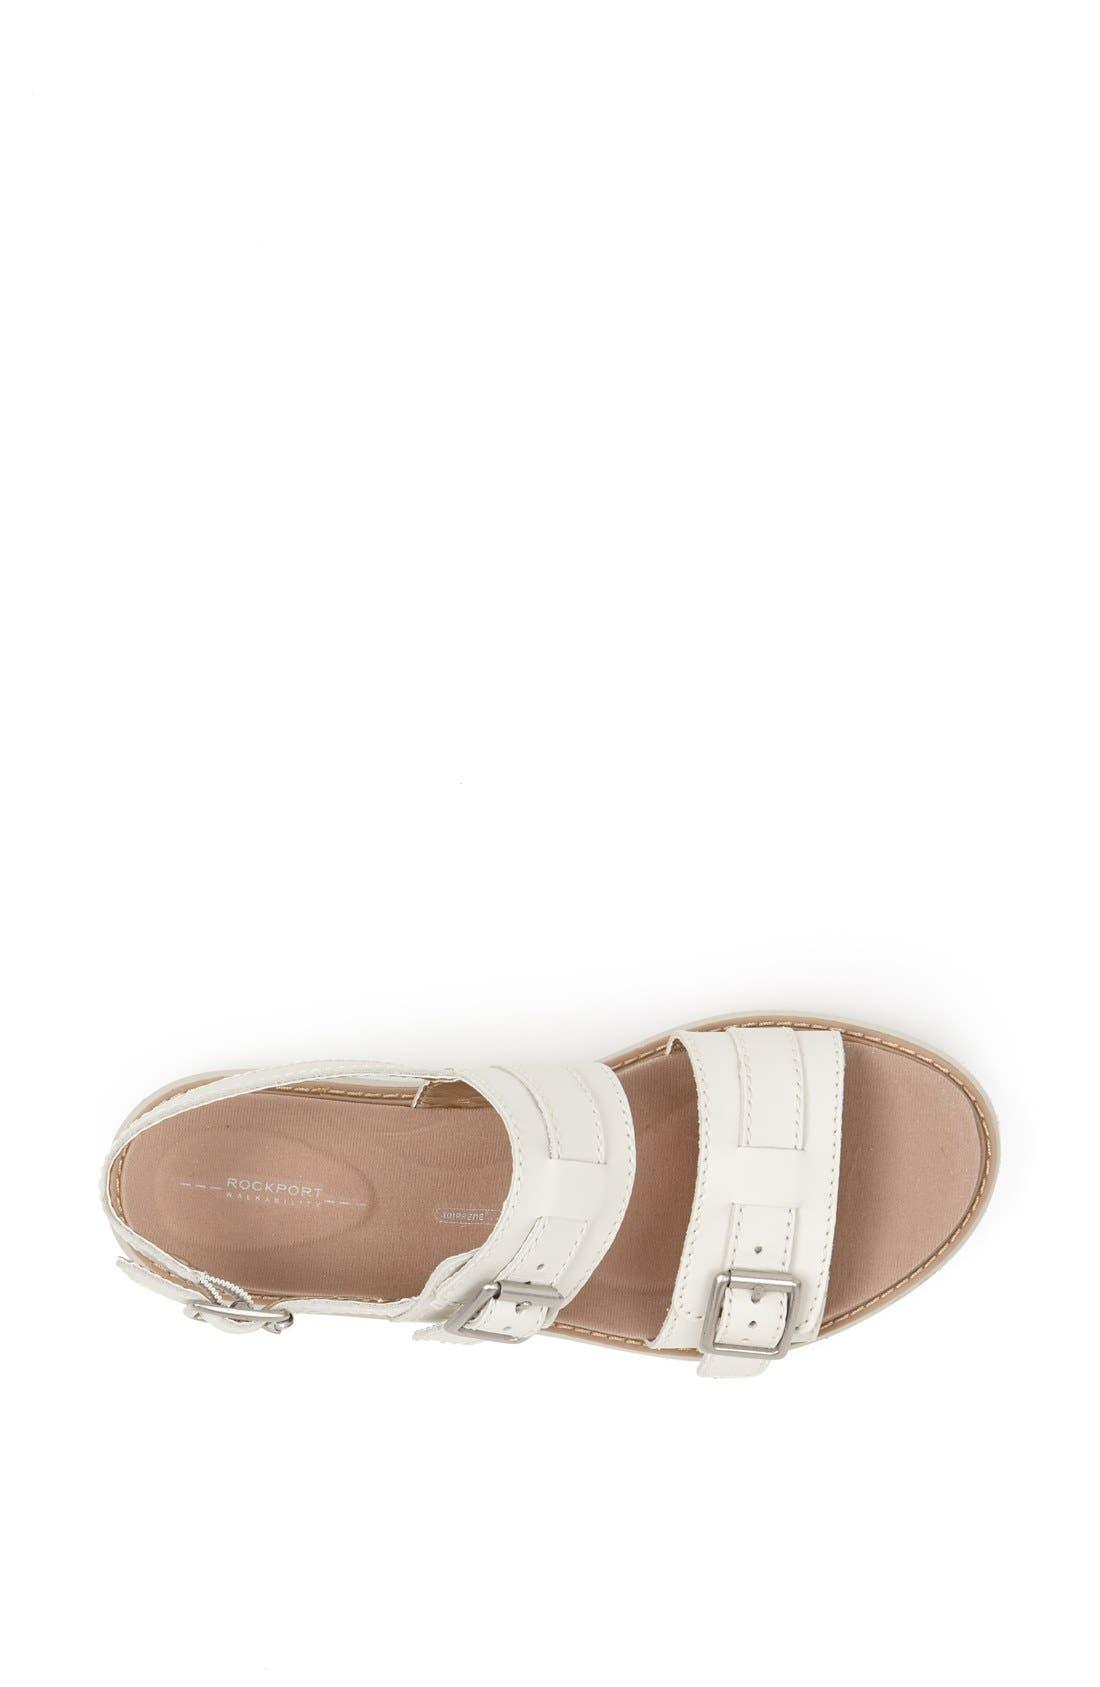 Alternate Image 3  - Rockport 'TruWalk - Zero' Sandal